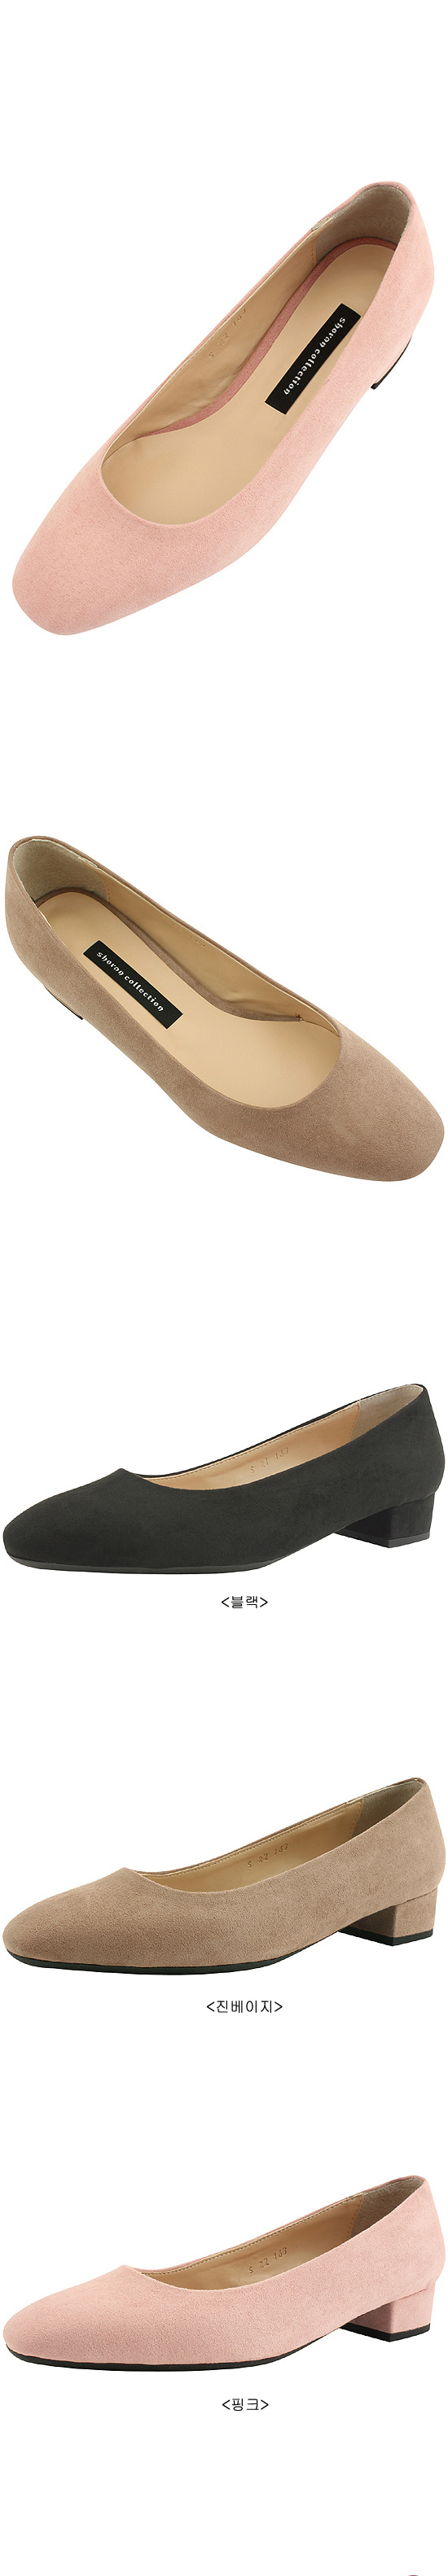 Suede Low Heel Pump 3cm Black